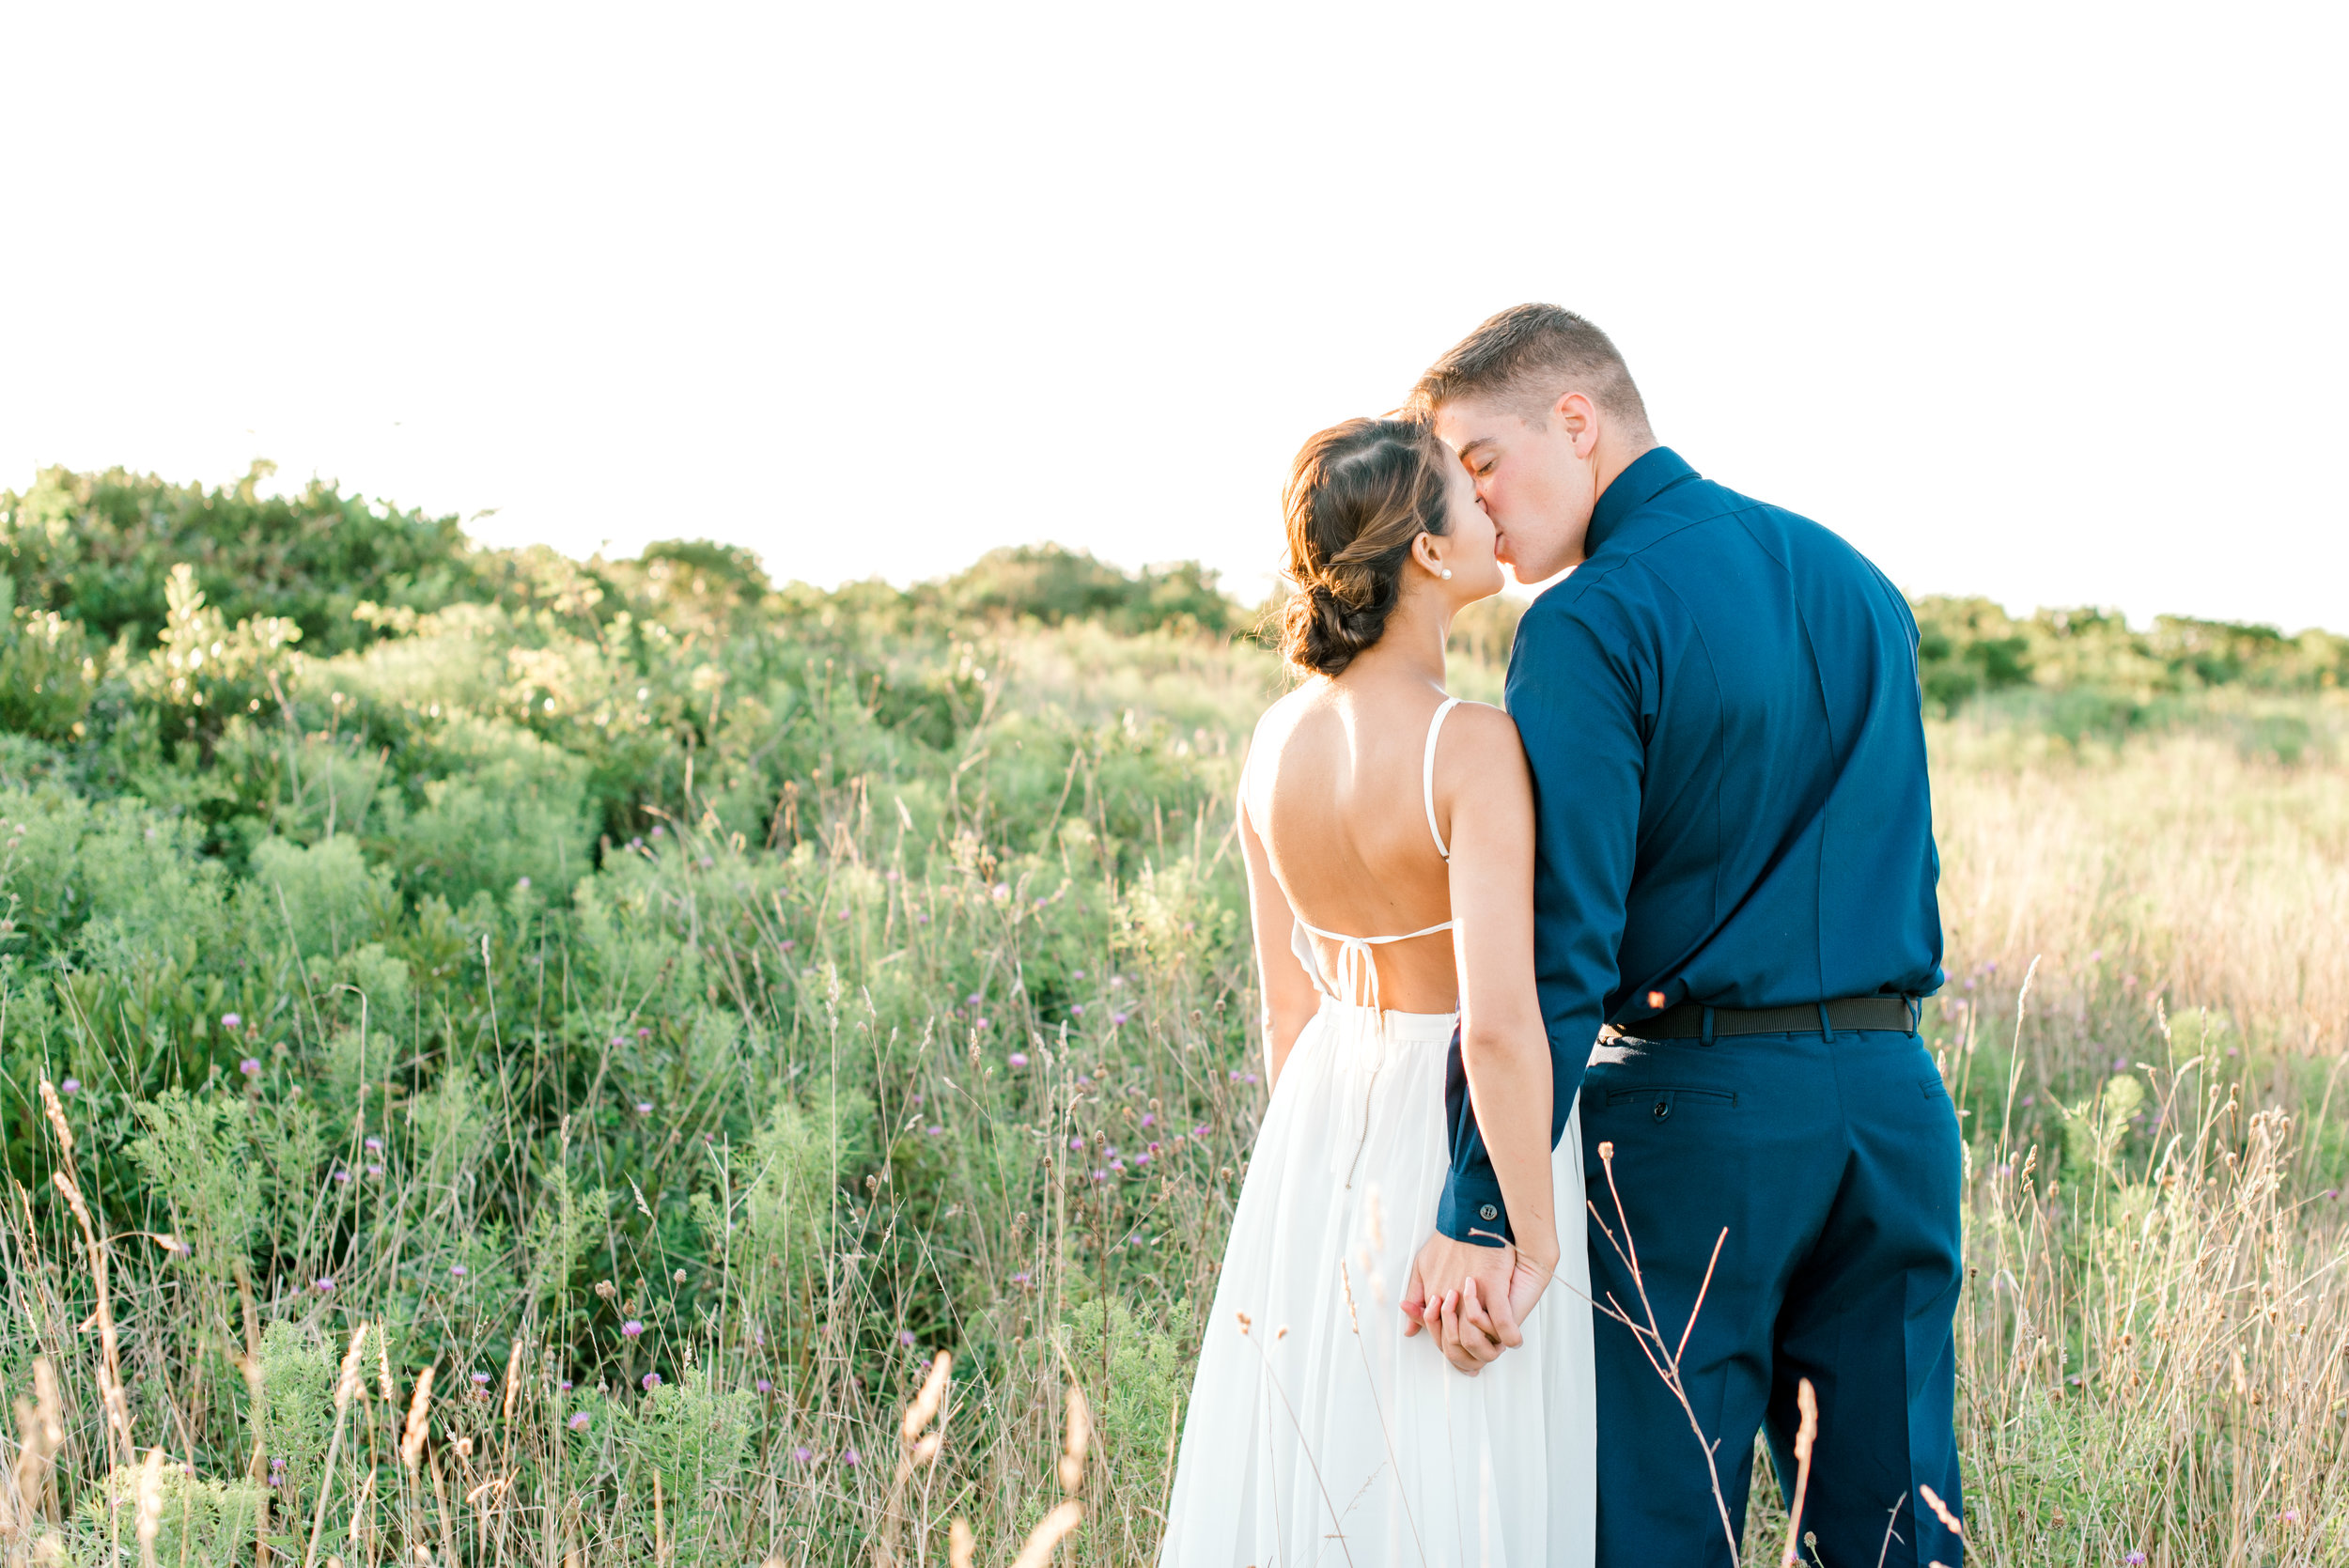 august23-newport-couples-photography-beach-5.jpg